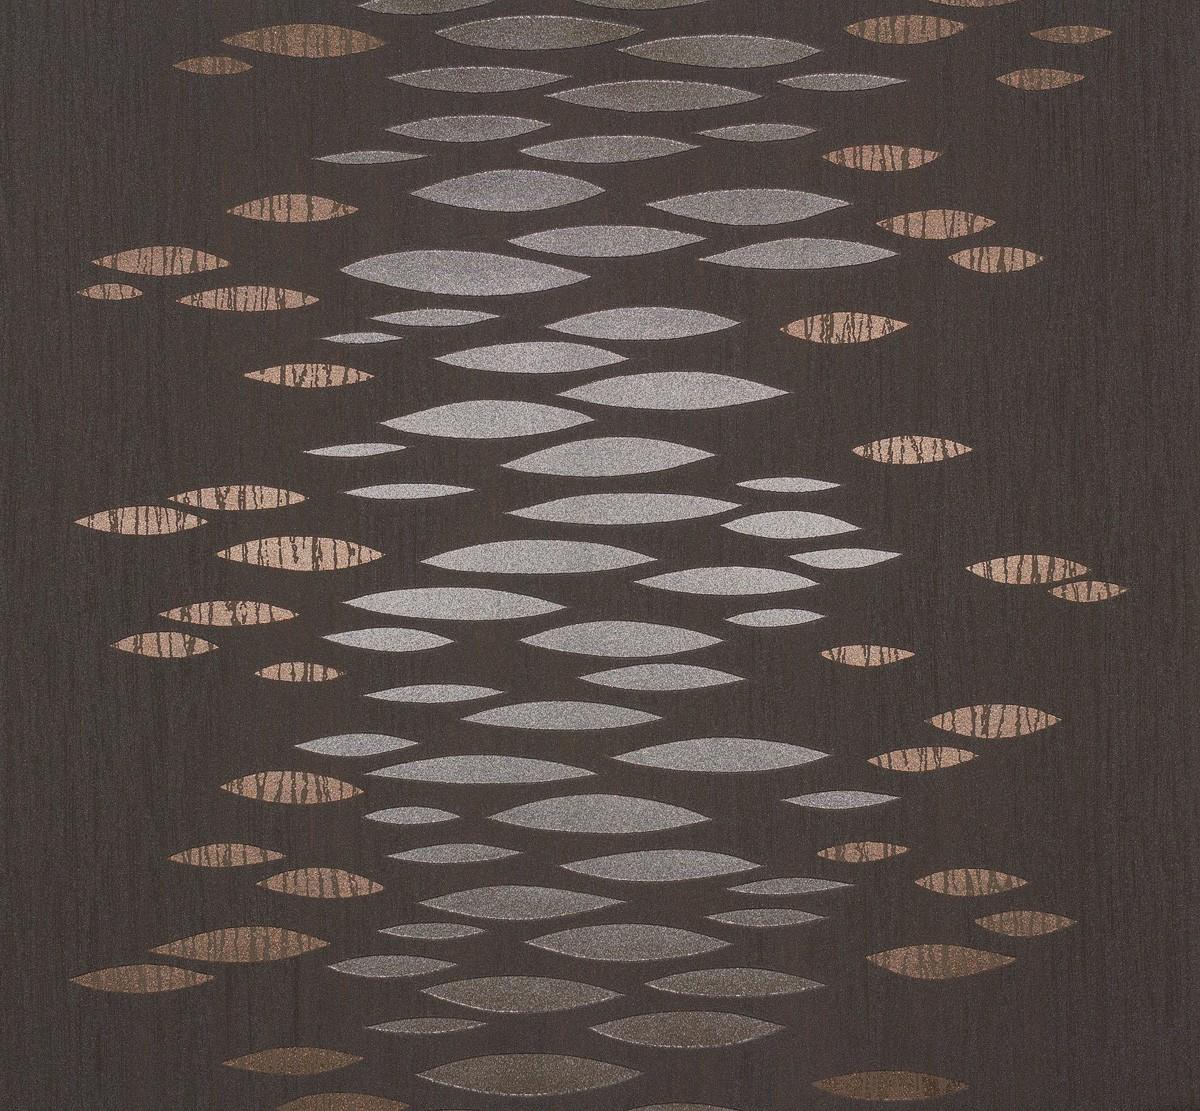 vliestapete design modern grau bronze metallic tapete marburg estelle 55727. Black Bedroom Furniture Sets. Home Design Ideas